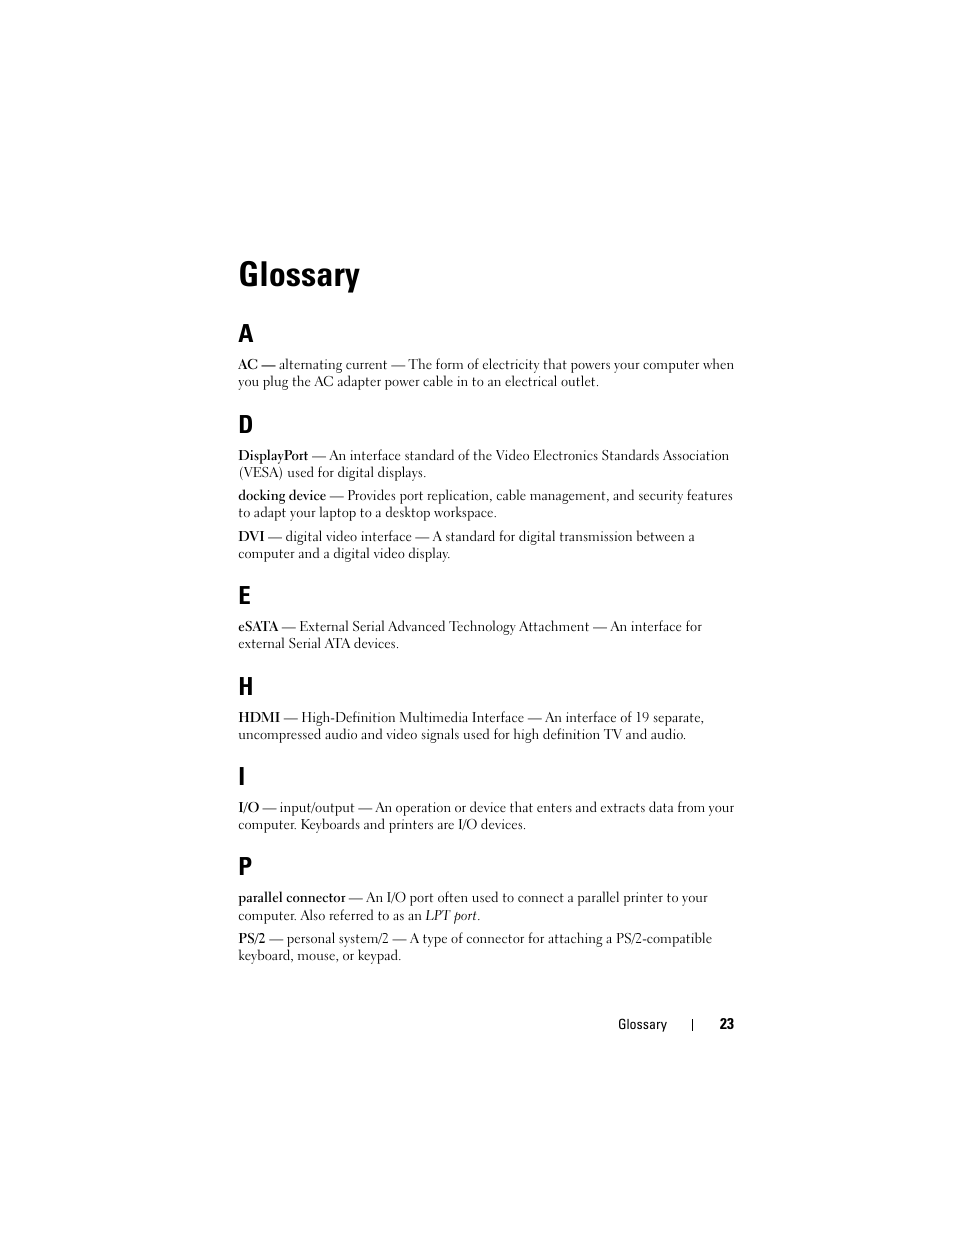 Glossary | Dell E-Port Plus User Manual | Page 23 / 24